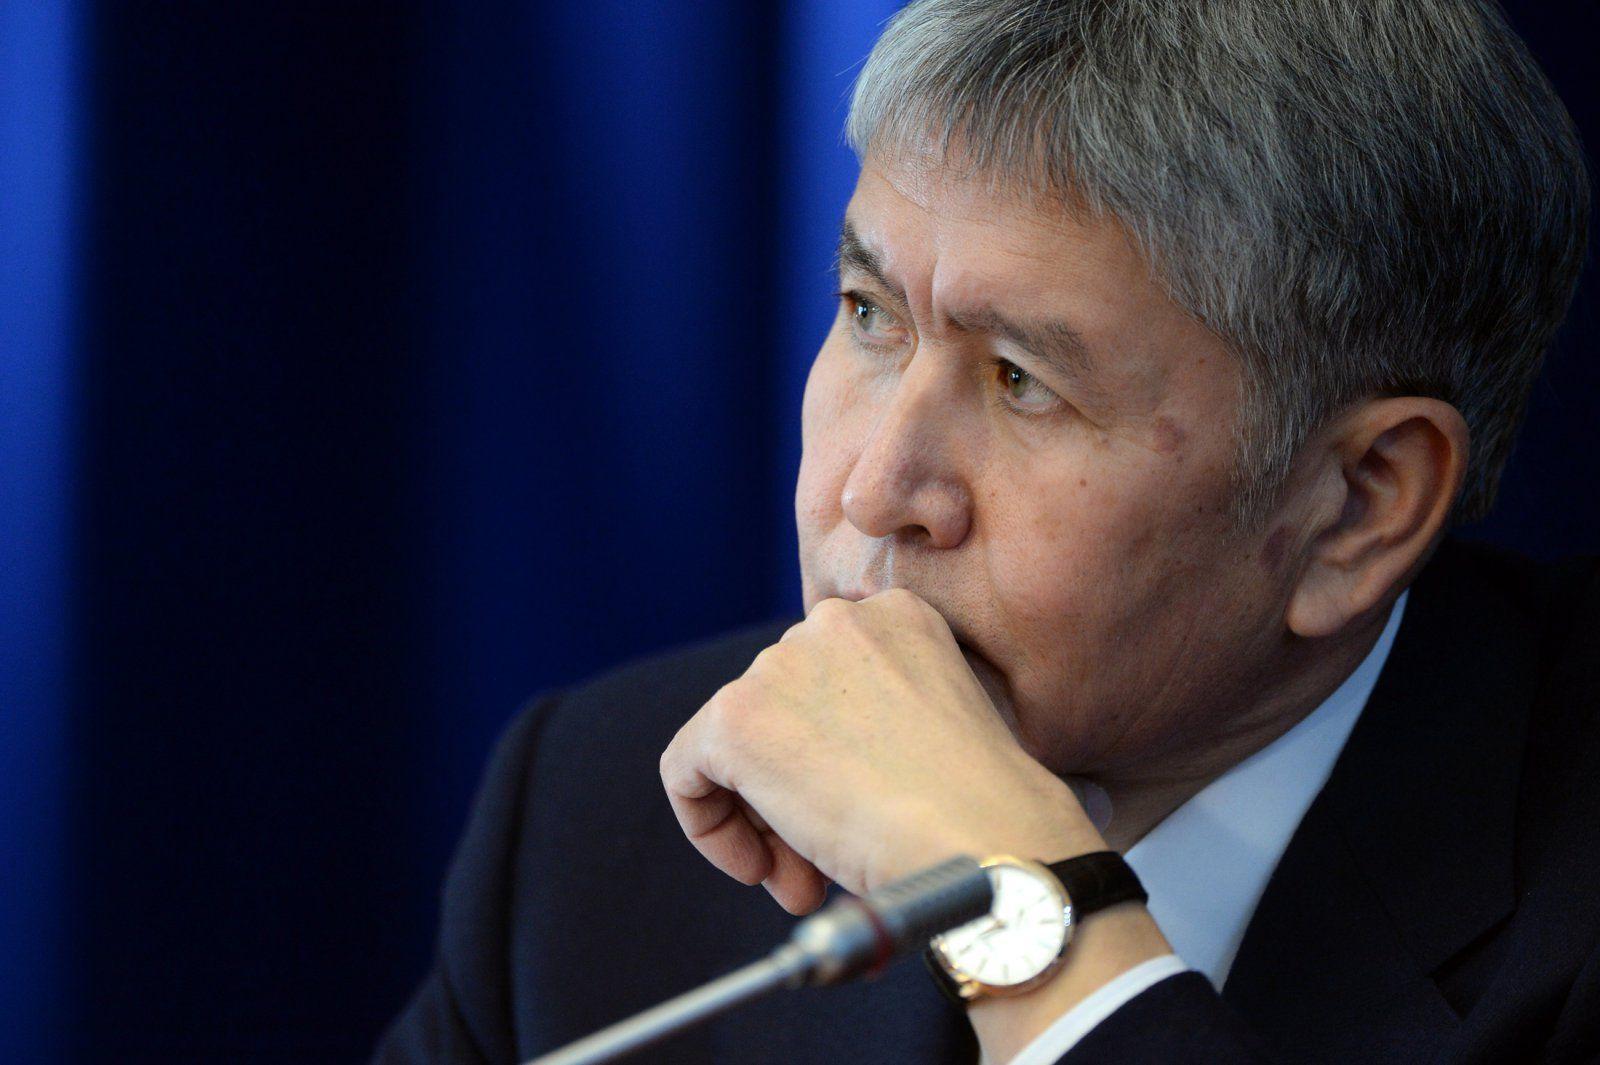 Экс-президент Кыргызстана переведен из СИЗО в больницу